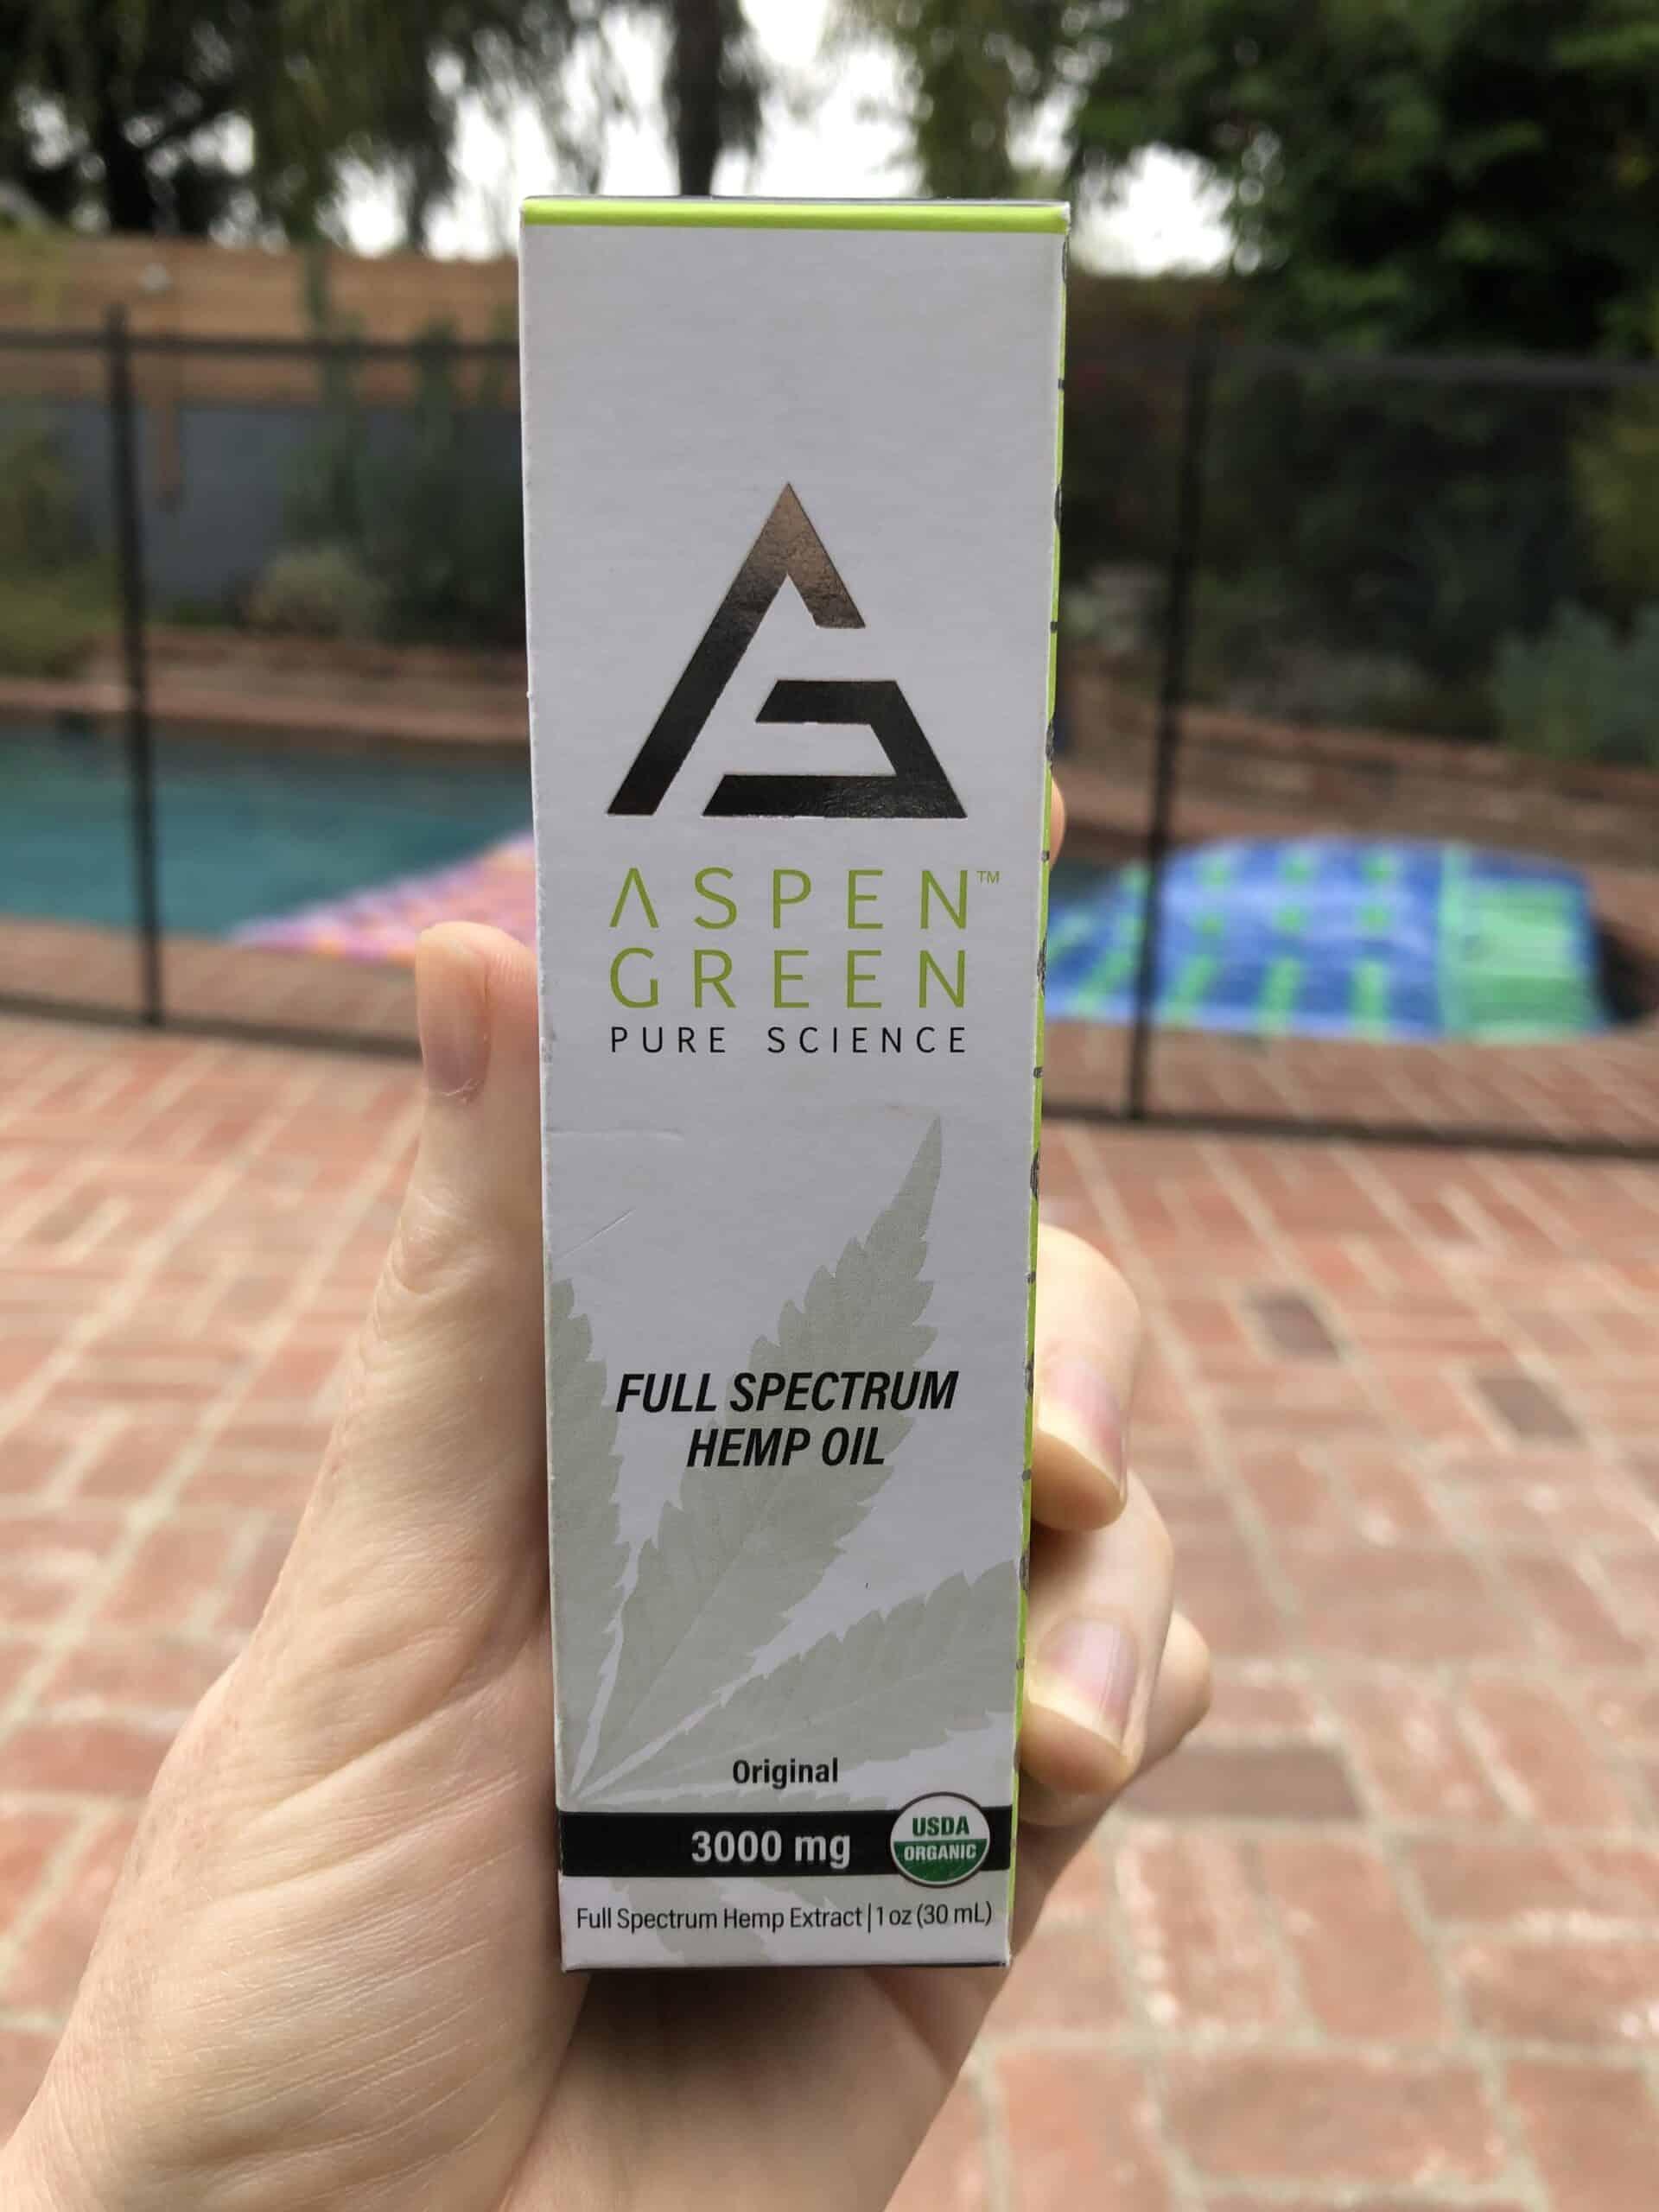 aspen green full spectrum hemp oil 3,000 mg save on cannabis review